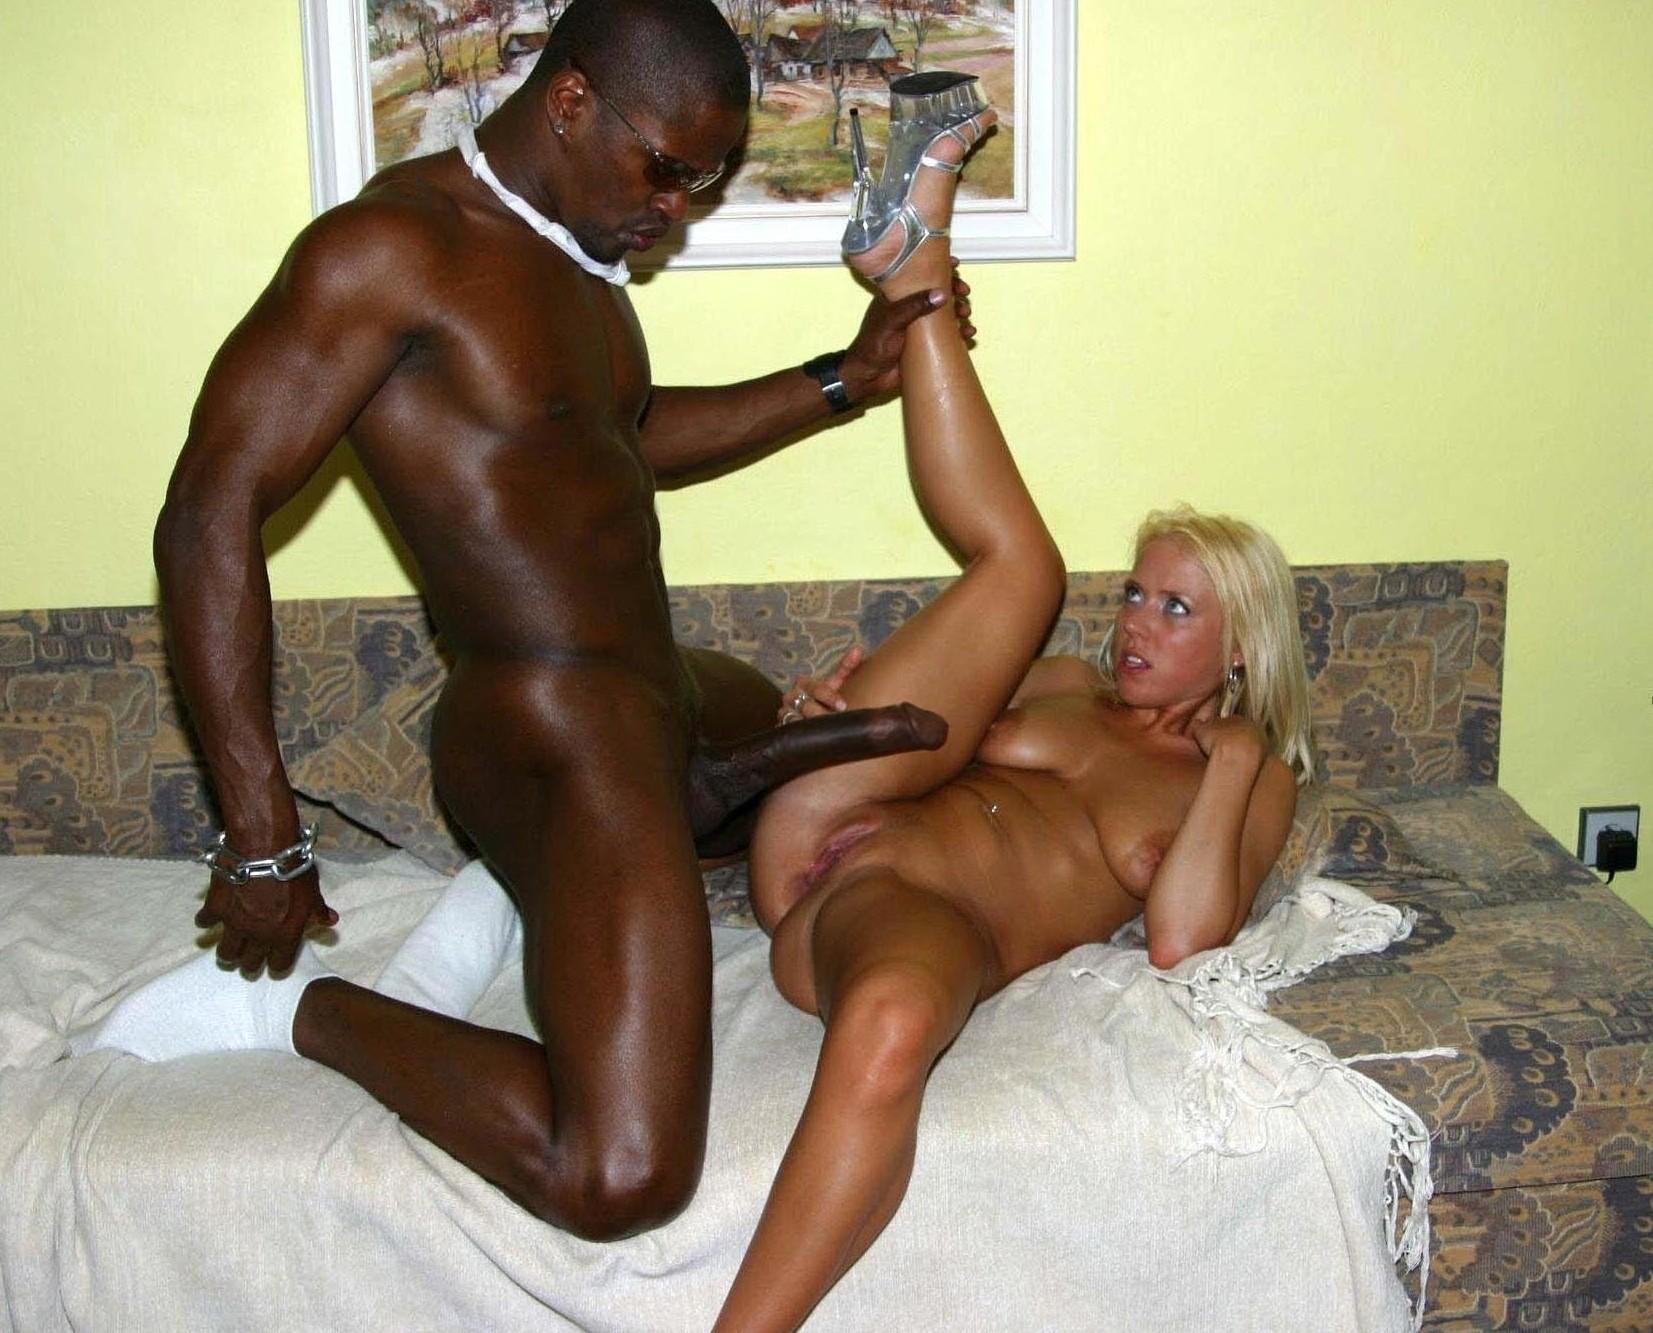 Interracial porn pics and black white sex vintage photo porn galleries